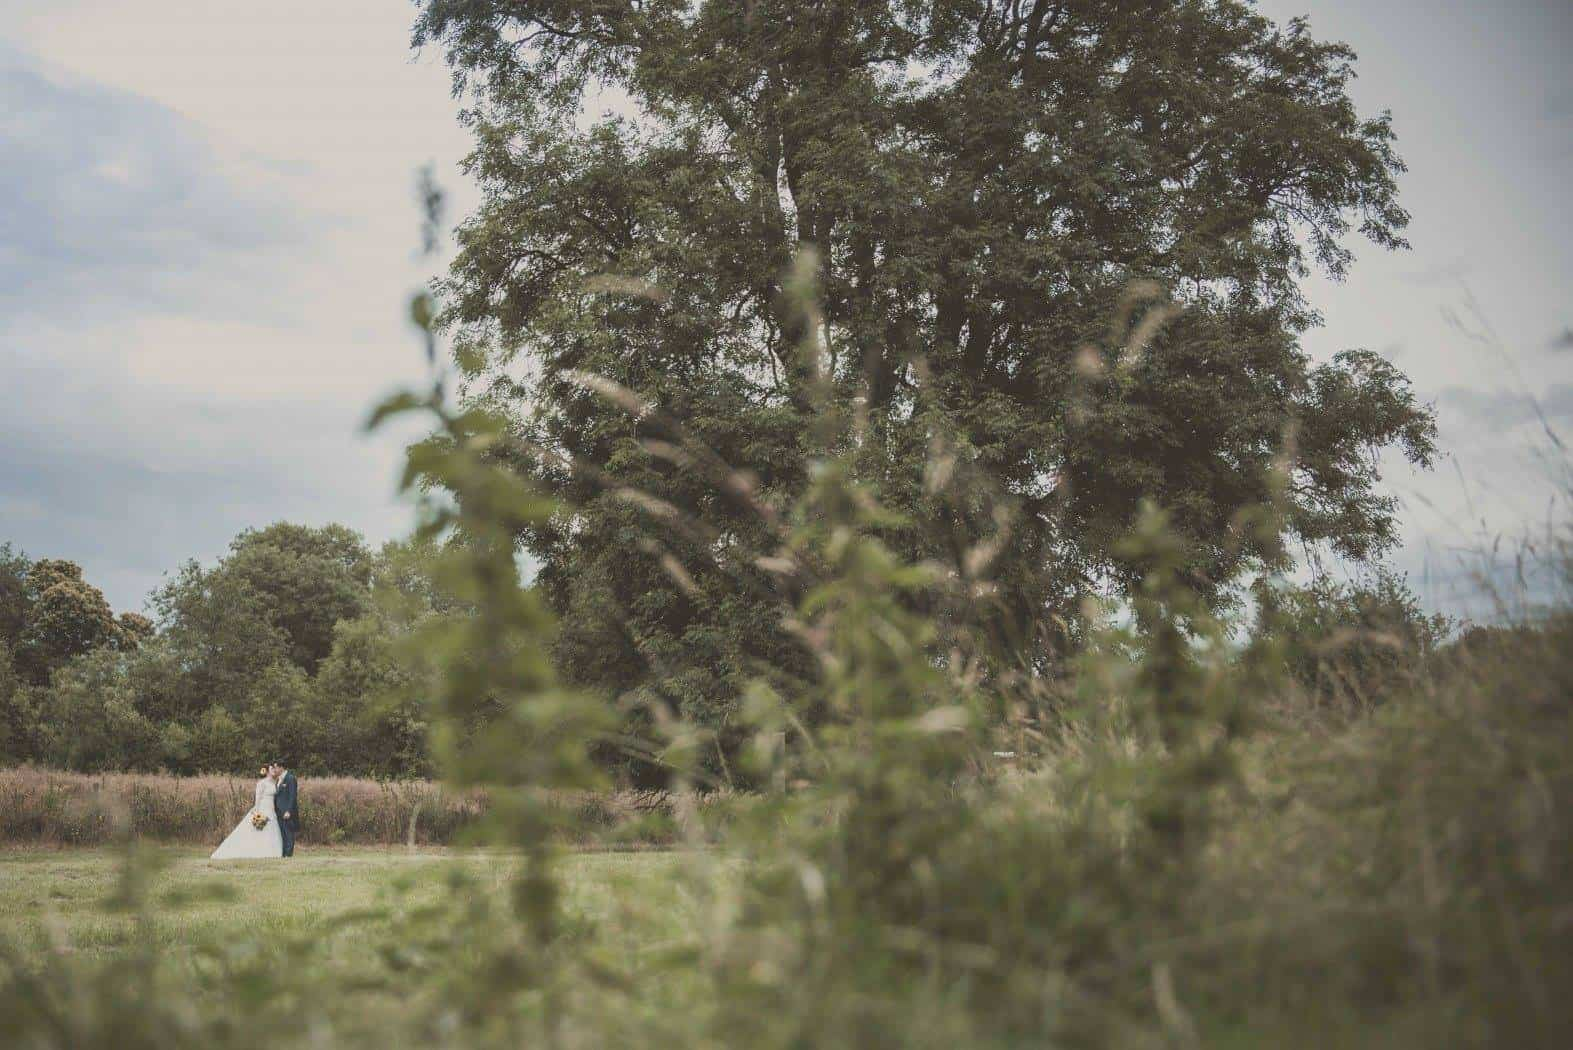 Dove Bank Weddings | Marston on Dove | Sami Tipi Wedding Venue00001